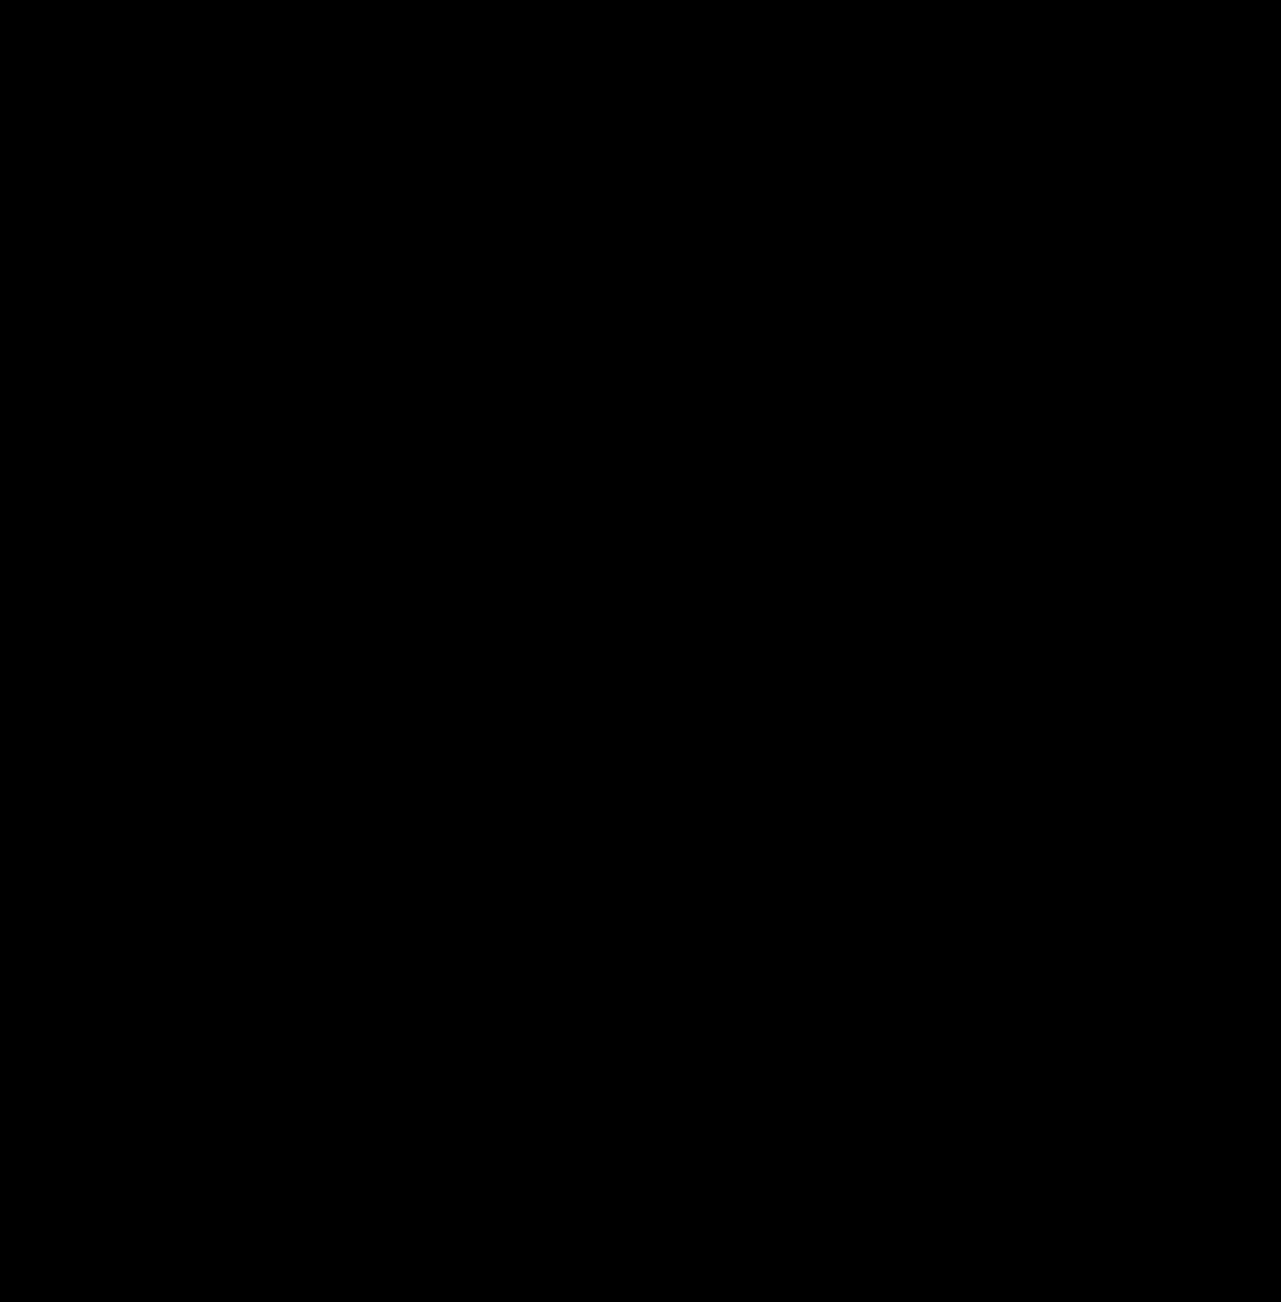 Sz – I – 06